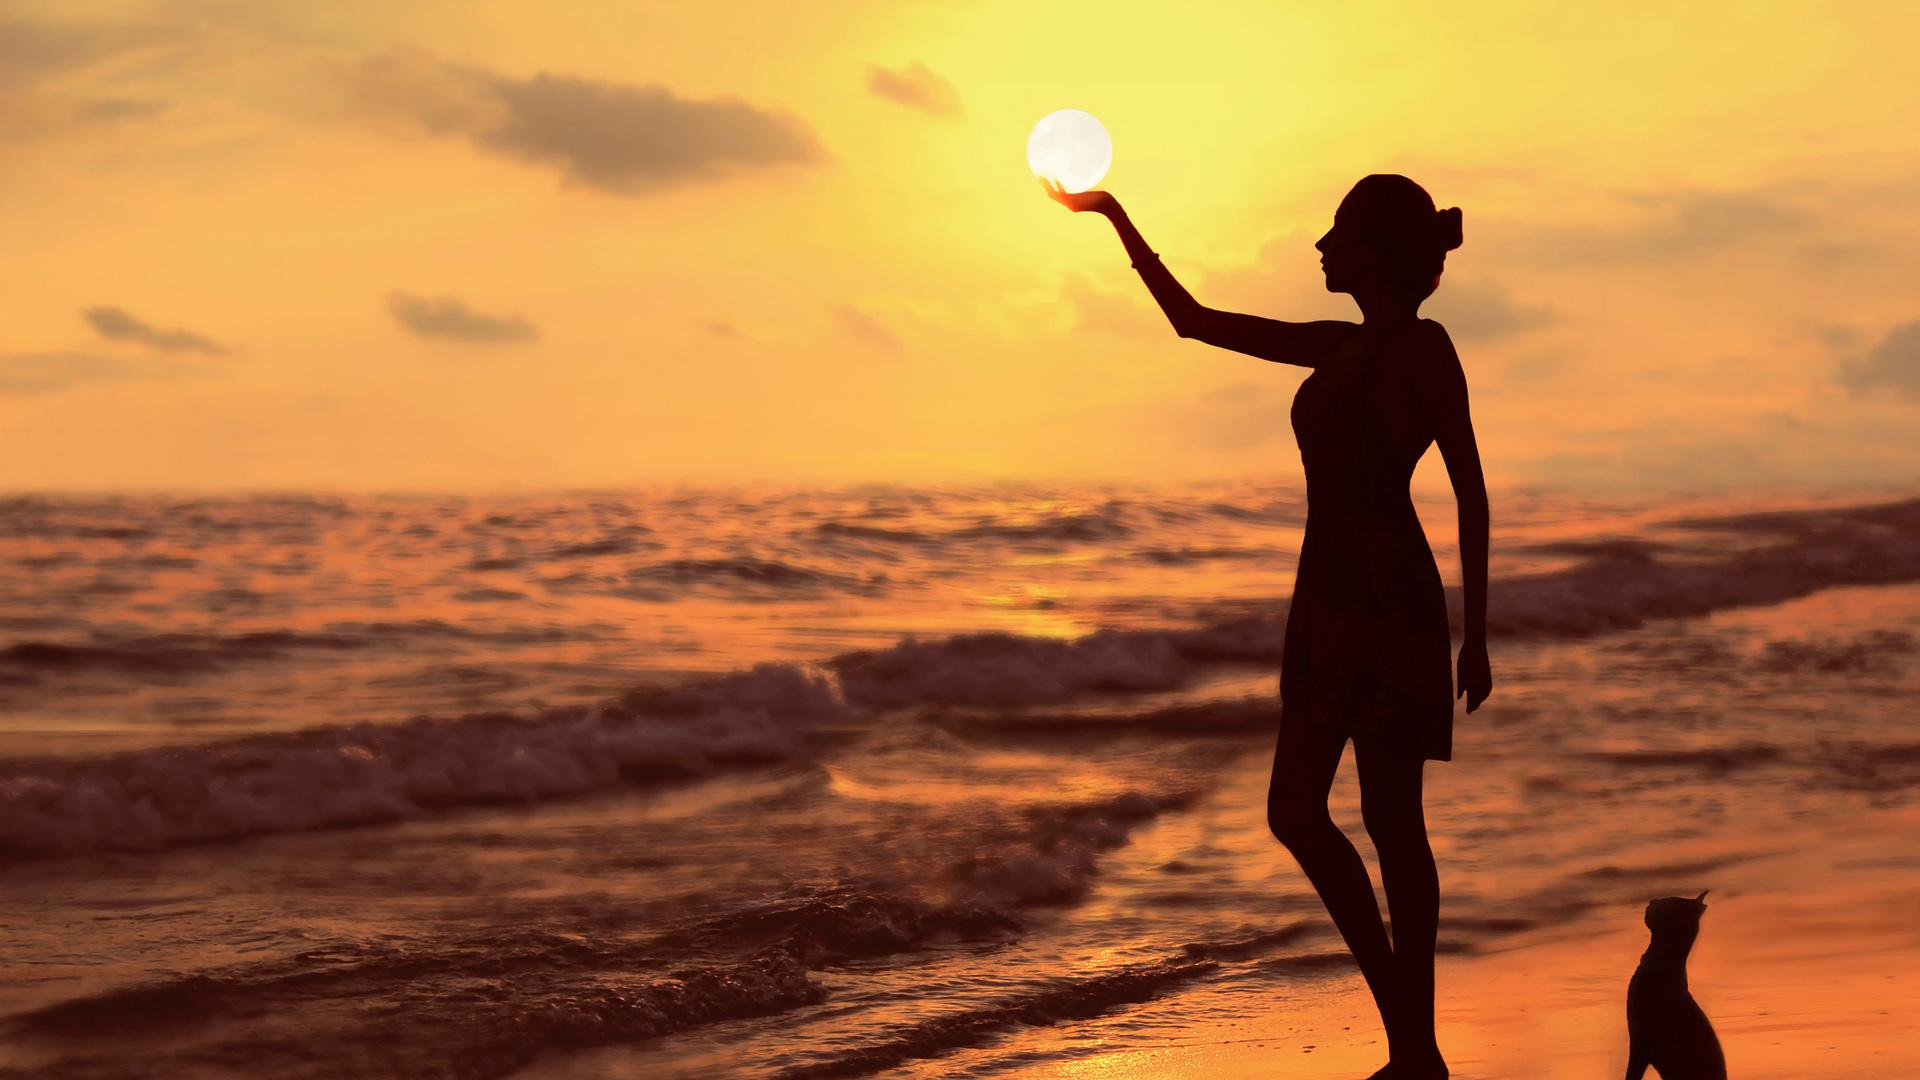 Фото девушек солнце море пляж